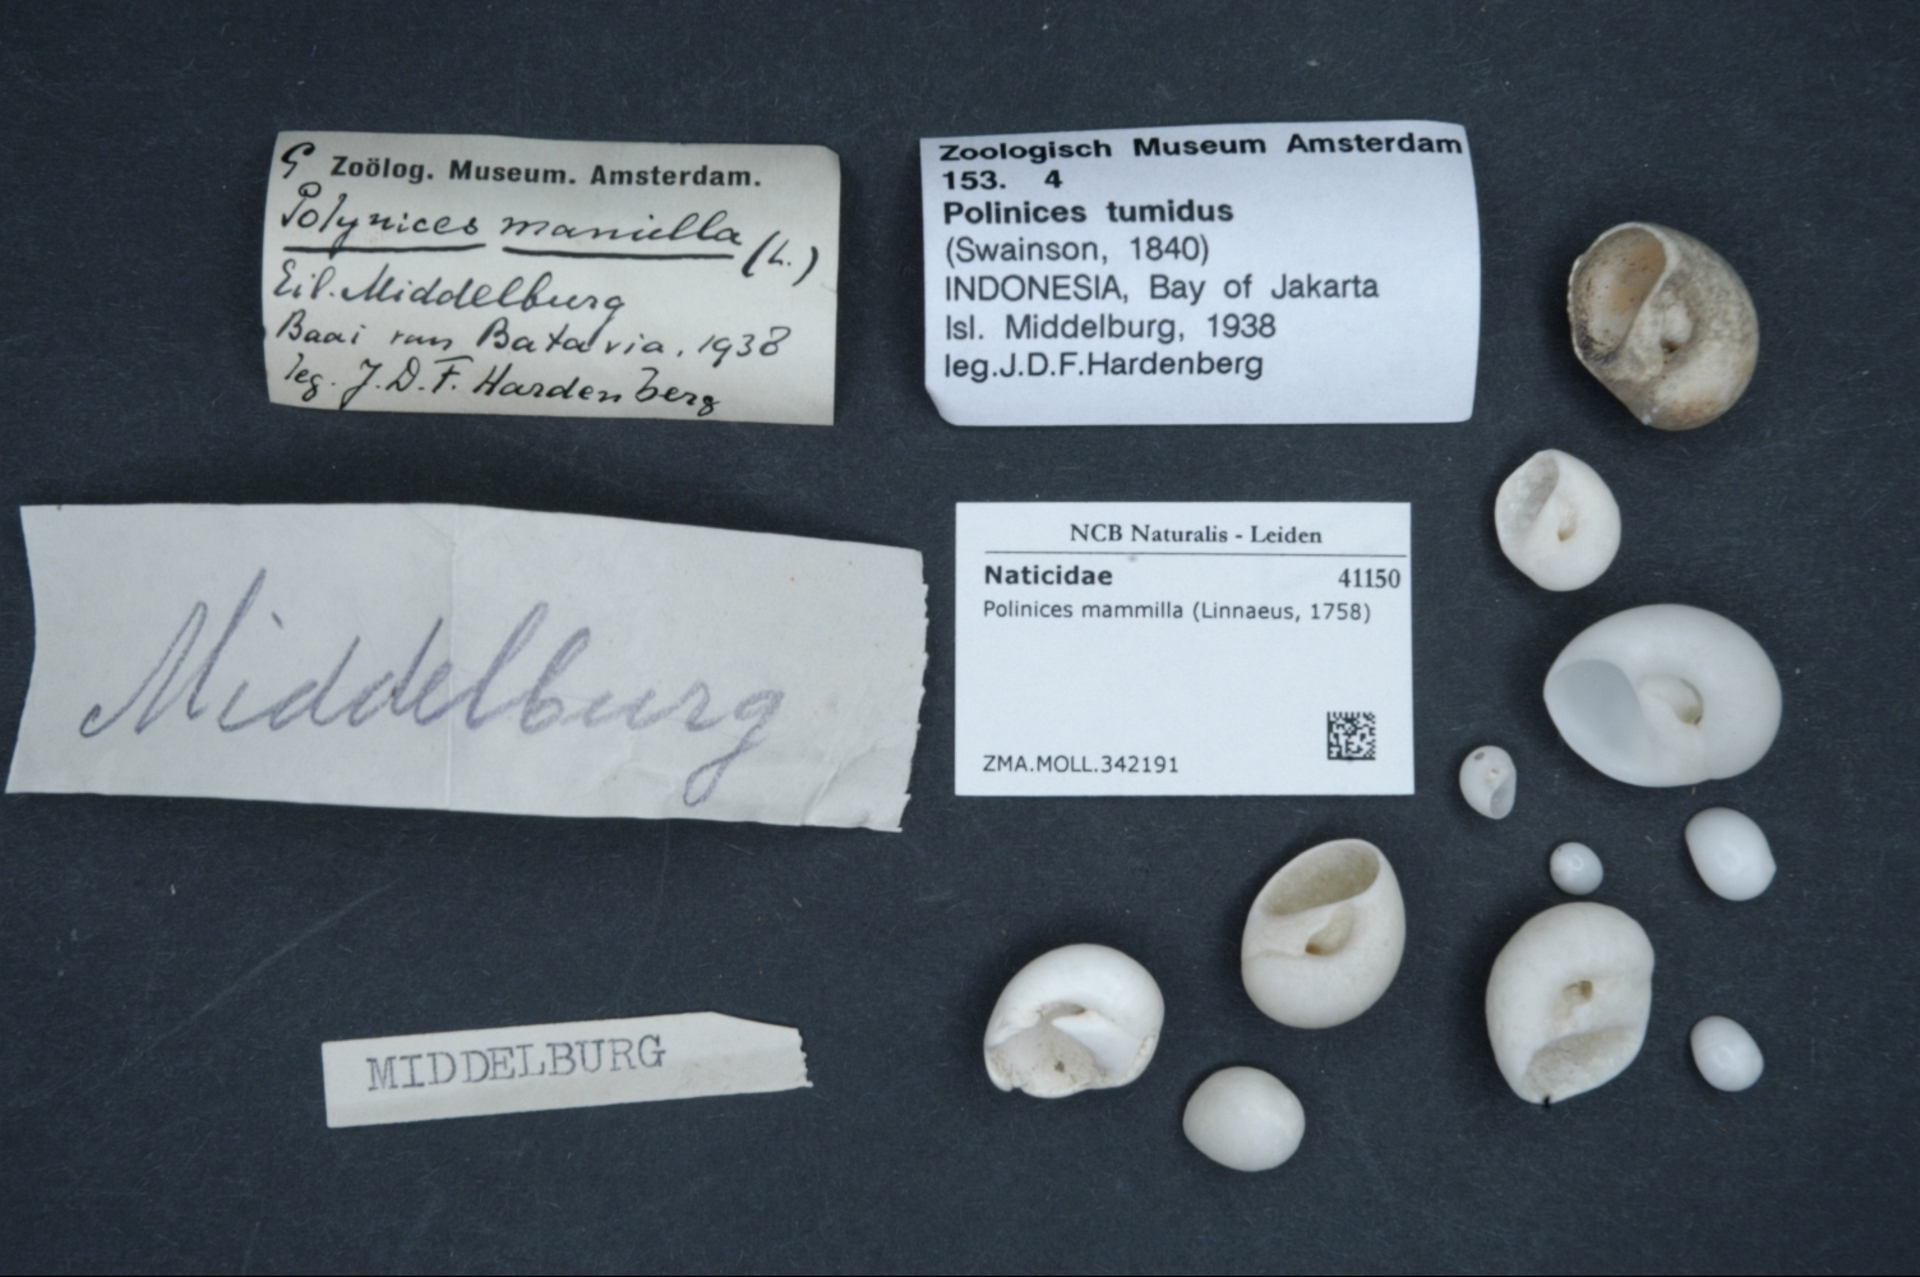 ZMA.MOLL.342191 | Polinices mammilla (Linnaeus, 1758)